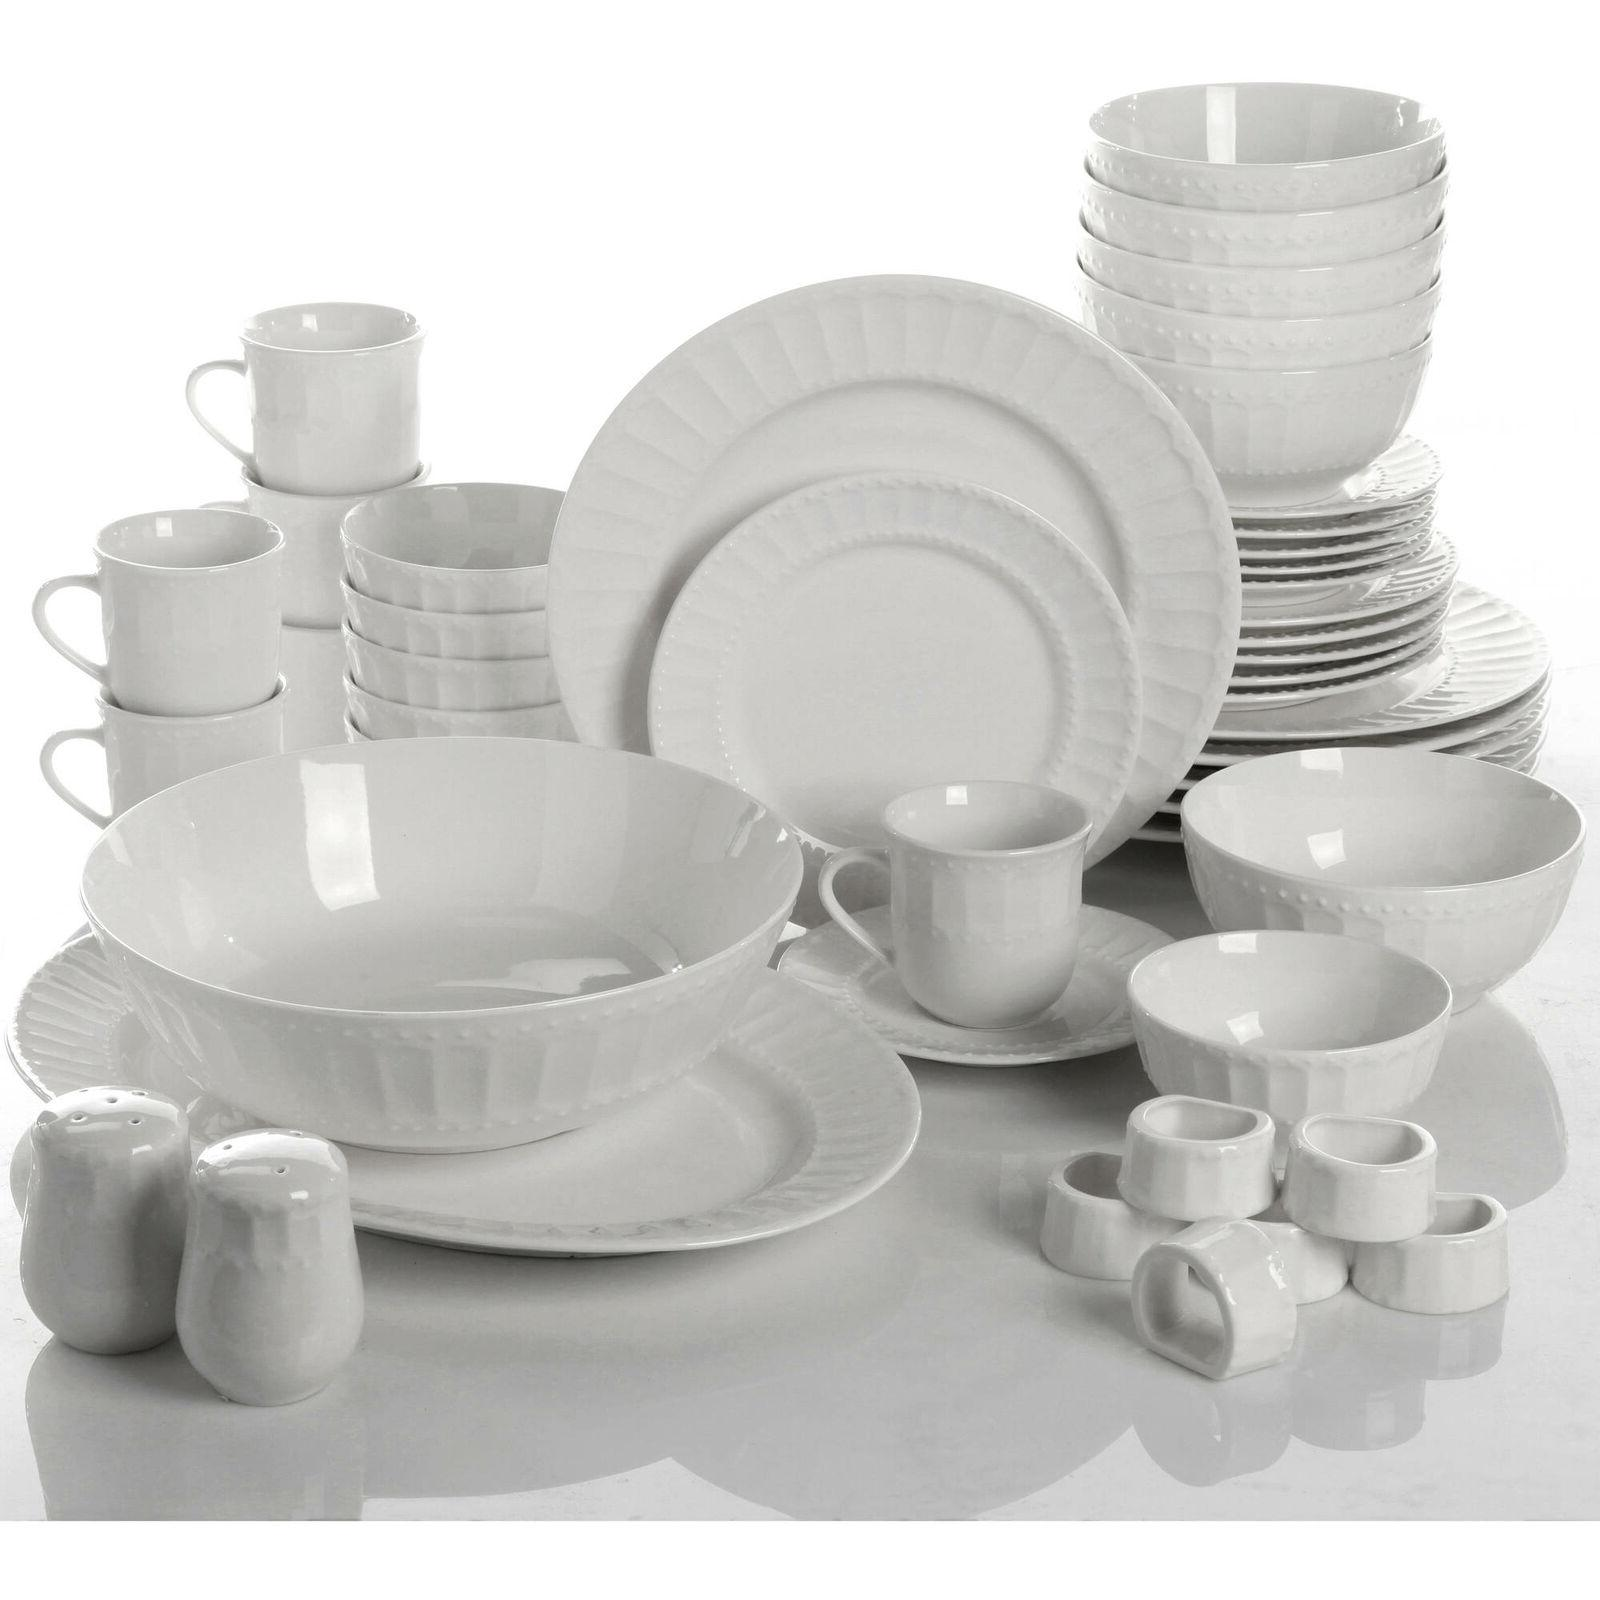 Gibson Home Regalia 46-Piece Dinnerware and Serveware Service 6 New